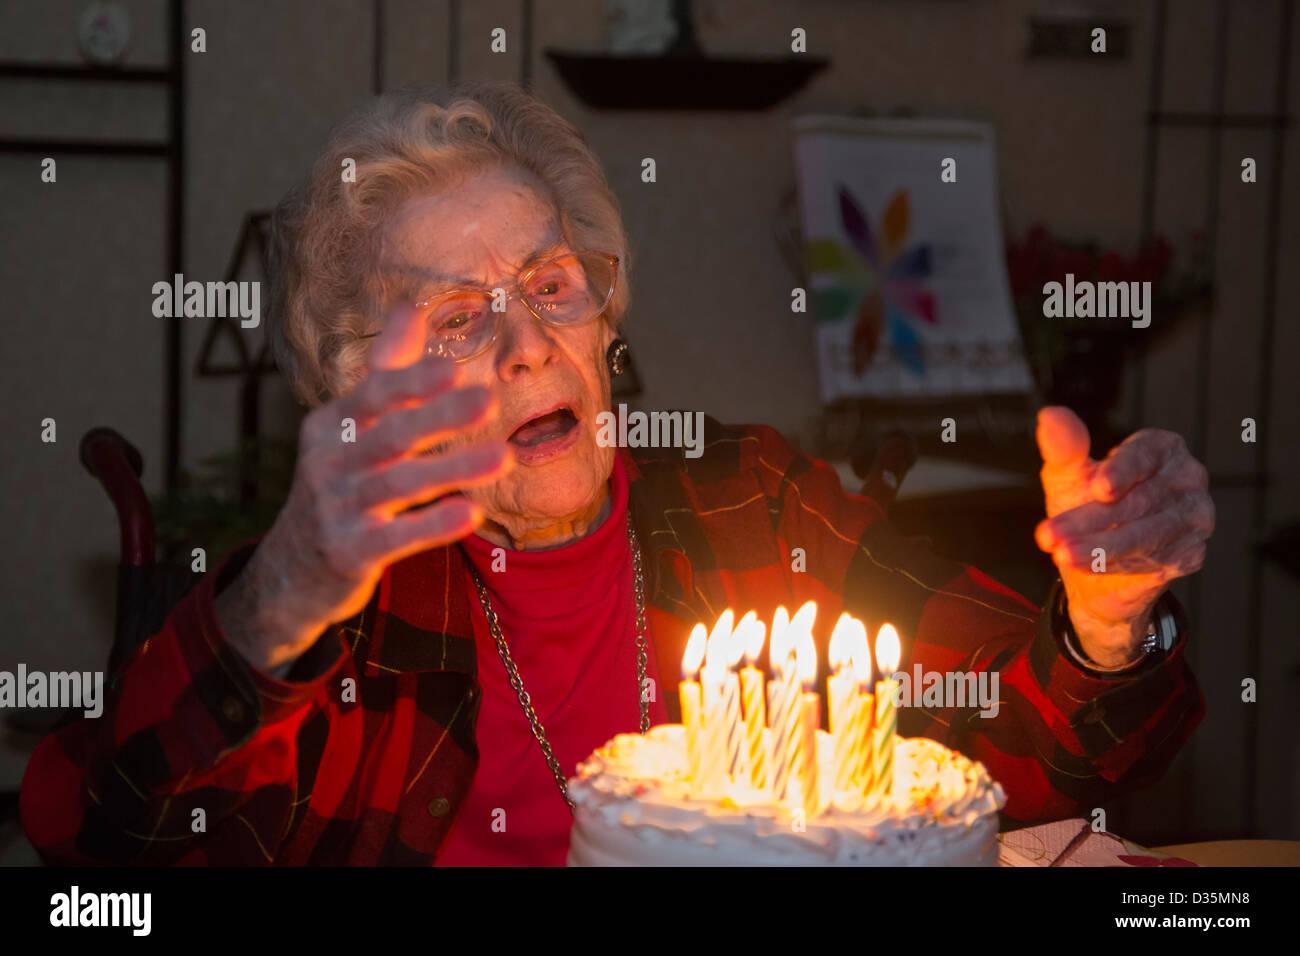 Sterling Heights, Michigan - Dorothy Newell celebra il suo 99° compleanno. Immagini Stock